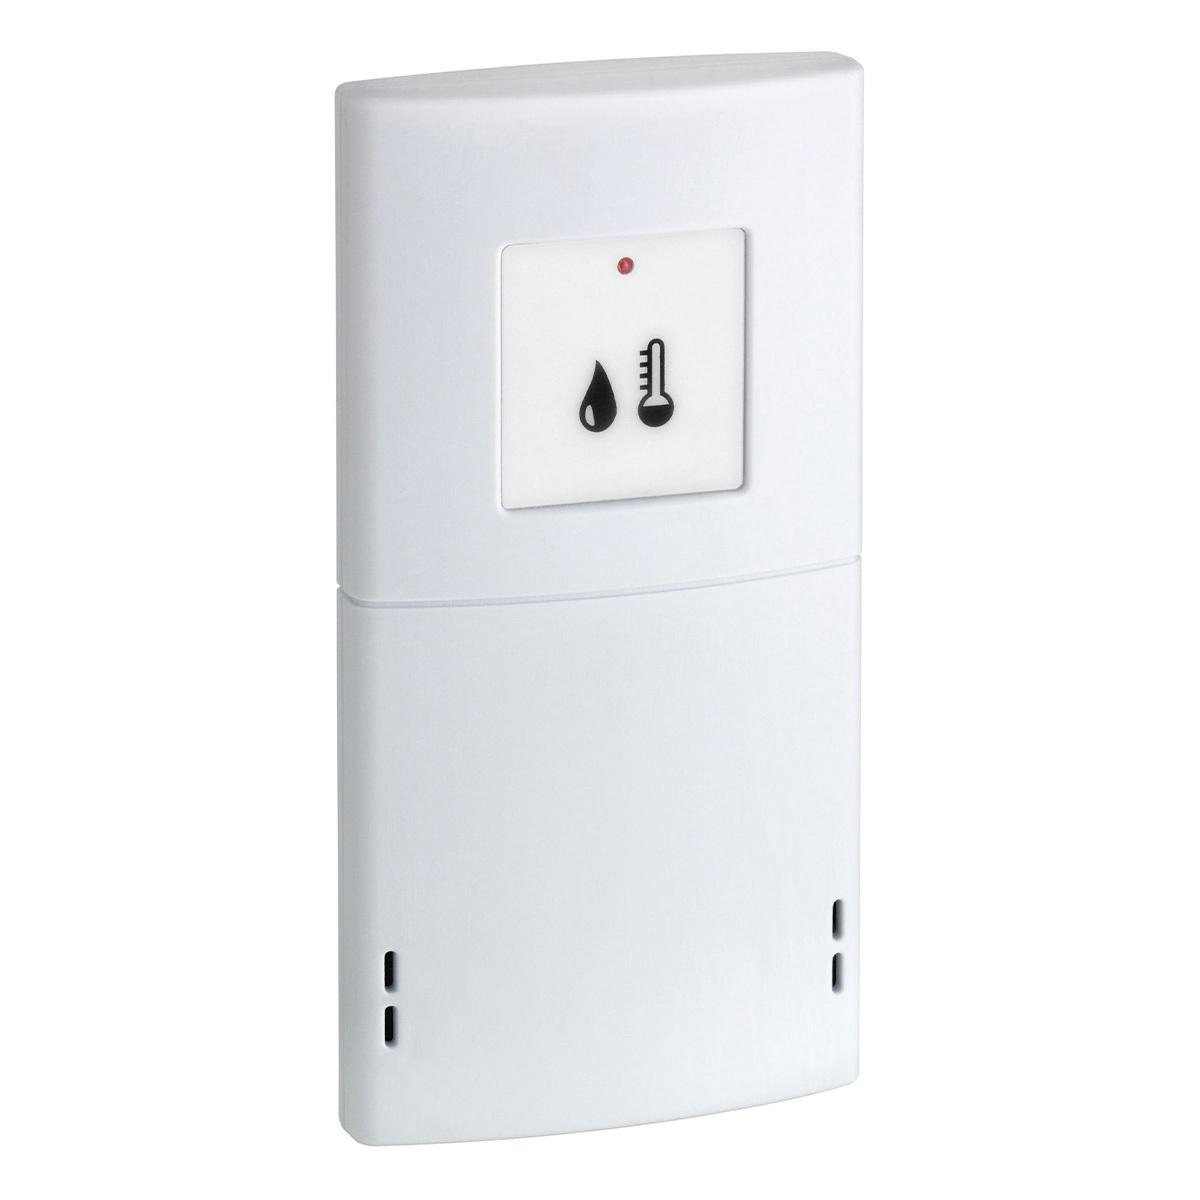 30-3196-thermo-hygro-sender-1200x200px.jpg